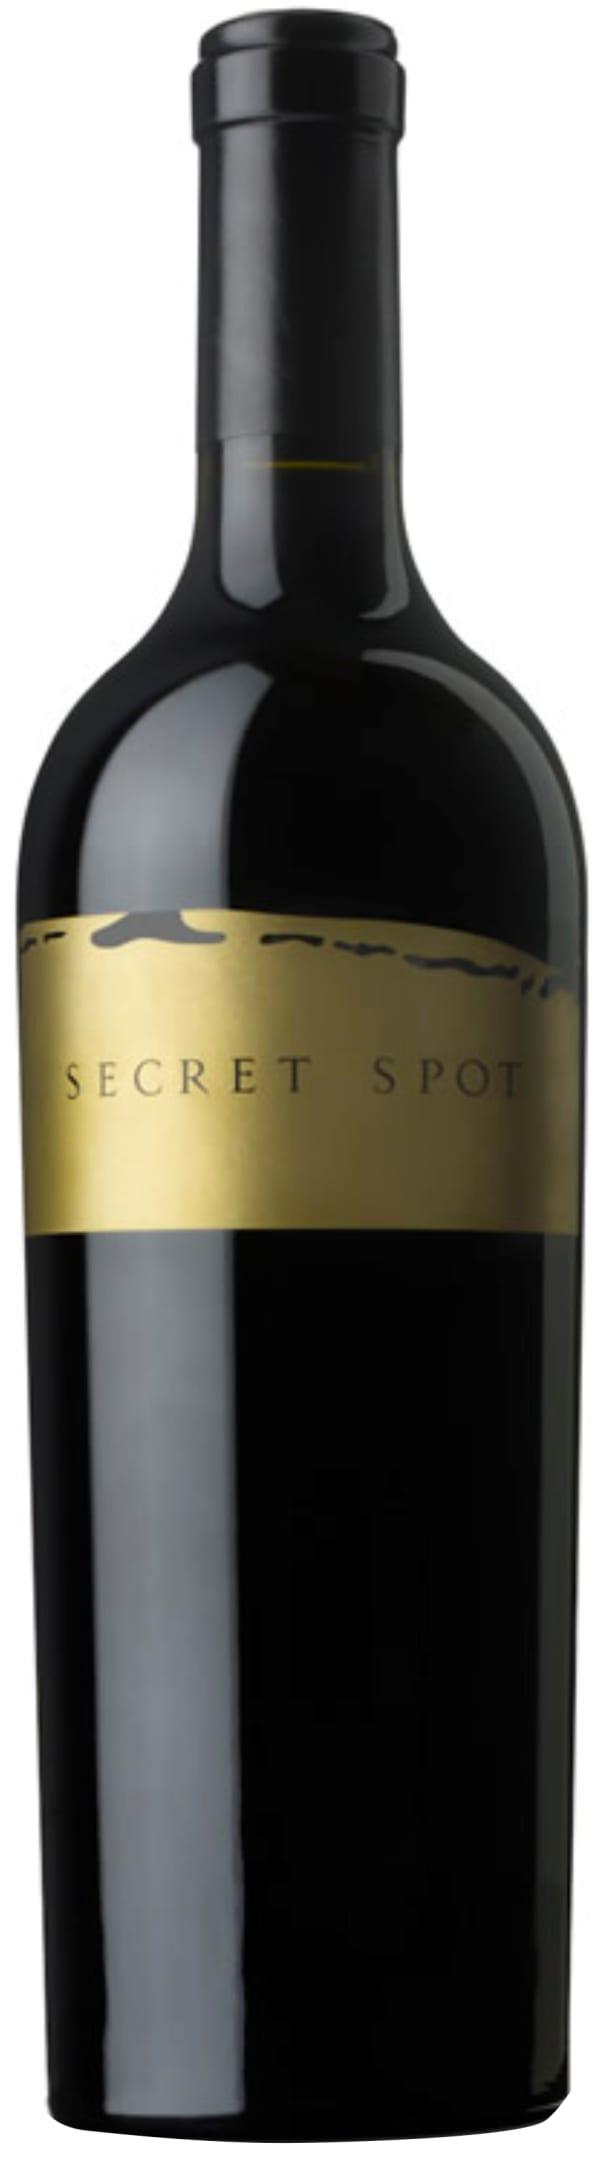 Secret Spot 2013